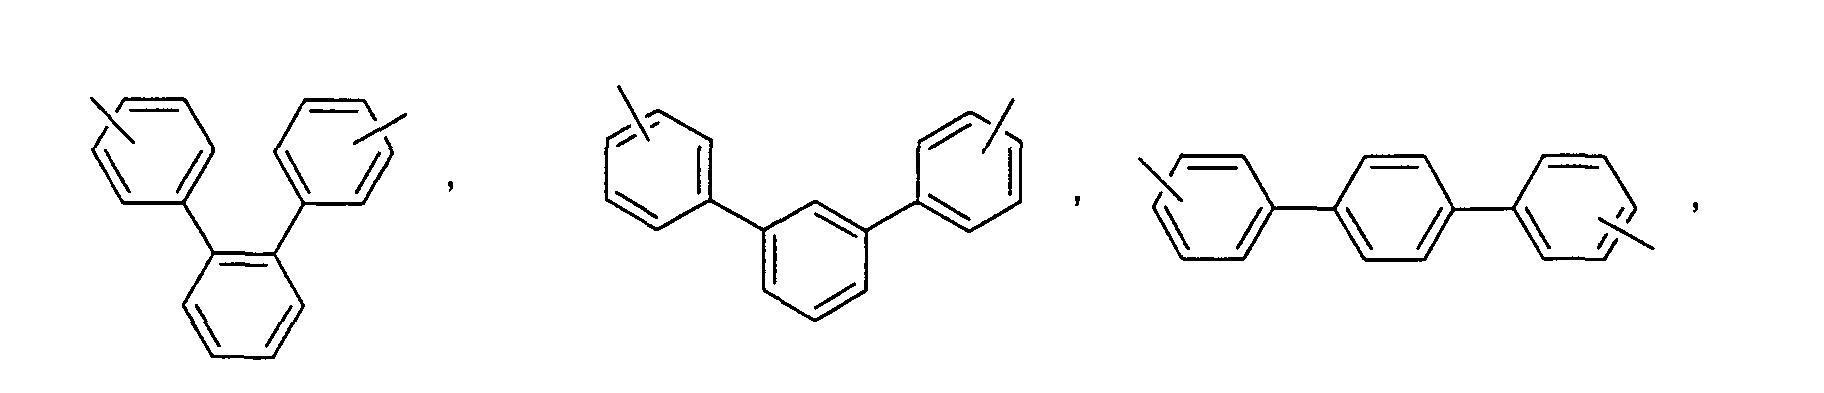 Figure 00240006